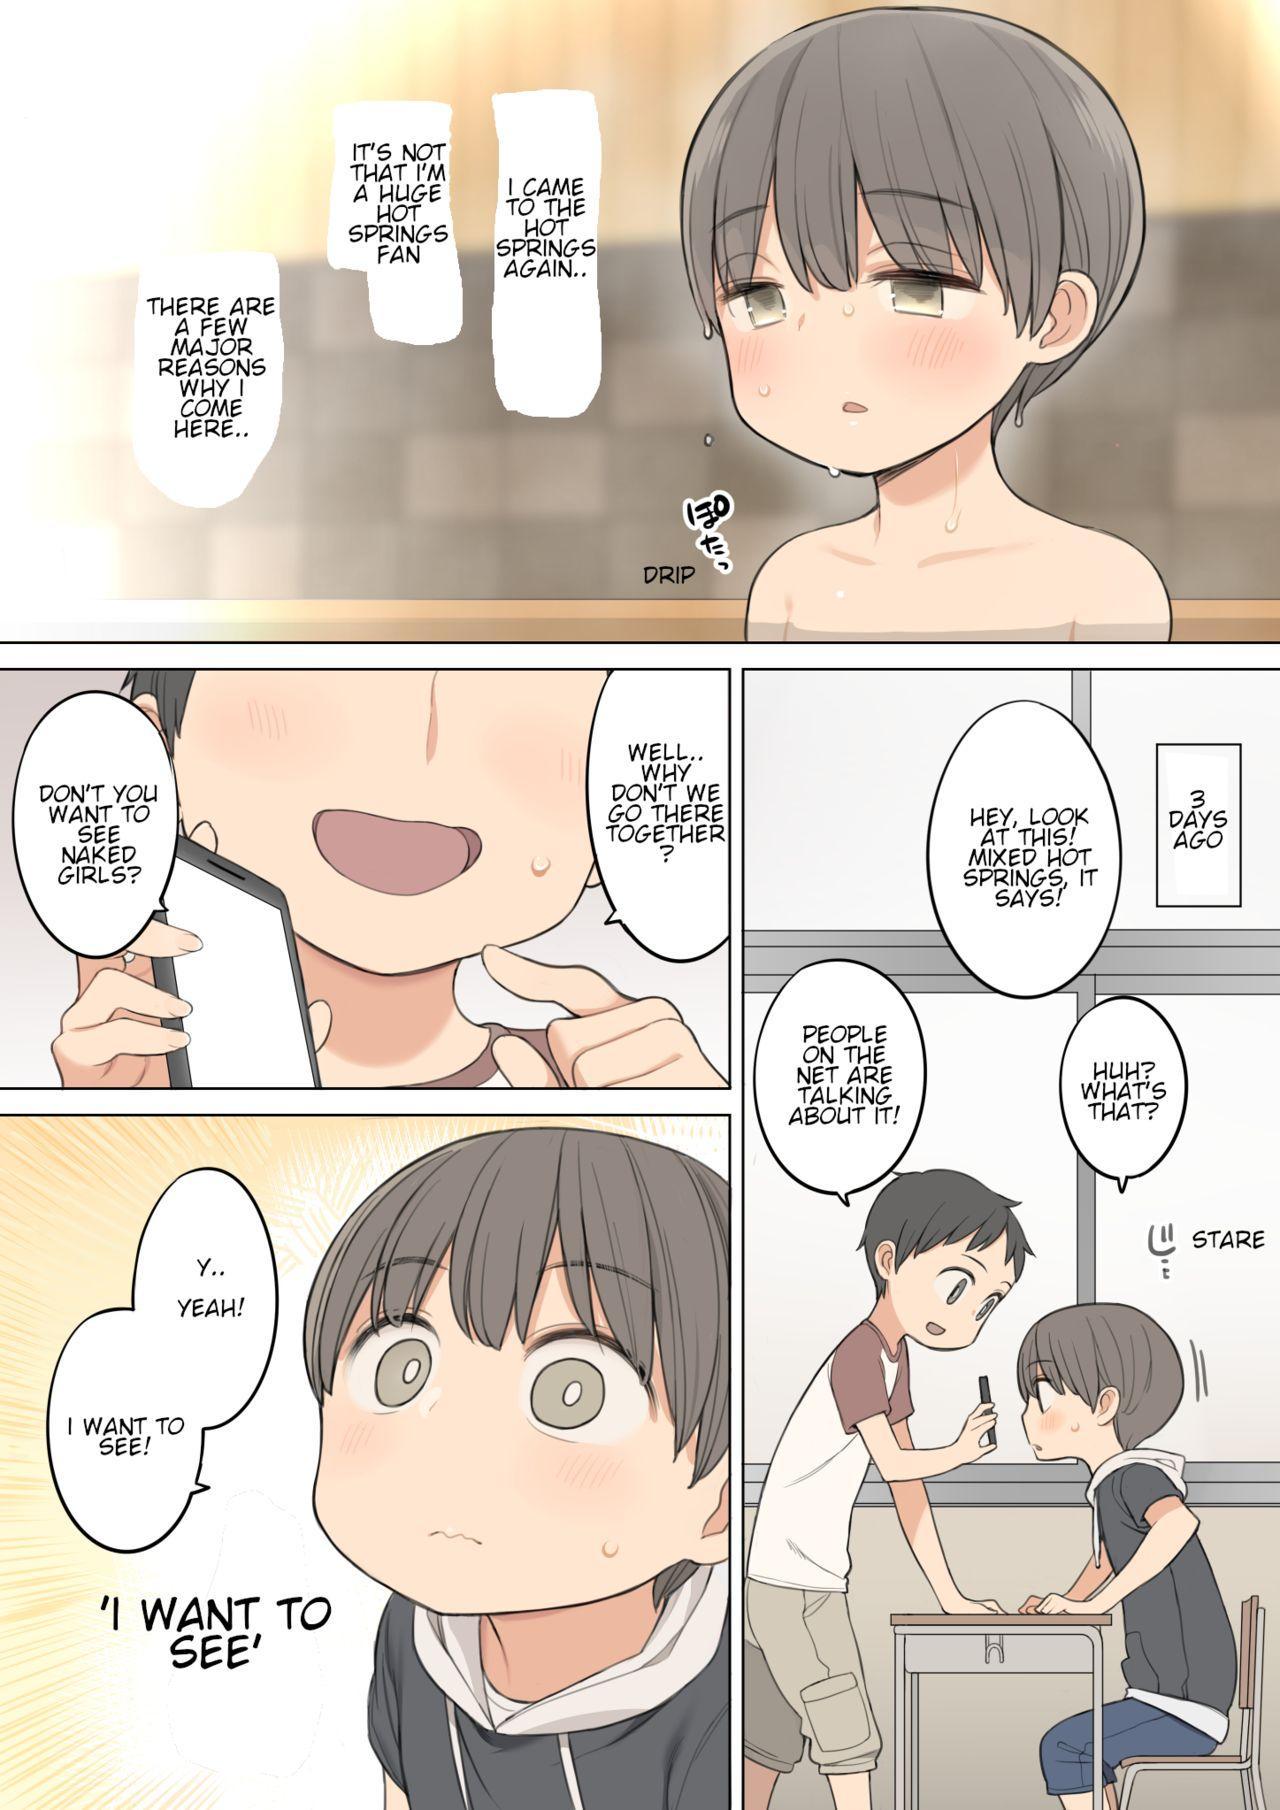 Konyoku Onsen de Toshiue no Onee-san ni Ippai Shasei Sasete Morau Hanashi | Story of how I came a lot with an older oneesan at the mixed hot spring bath 0